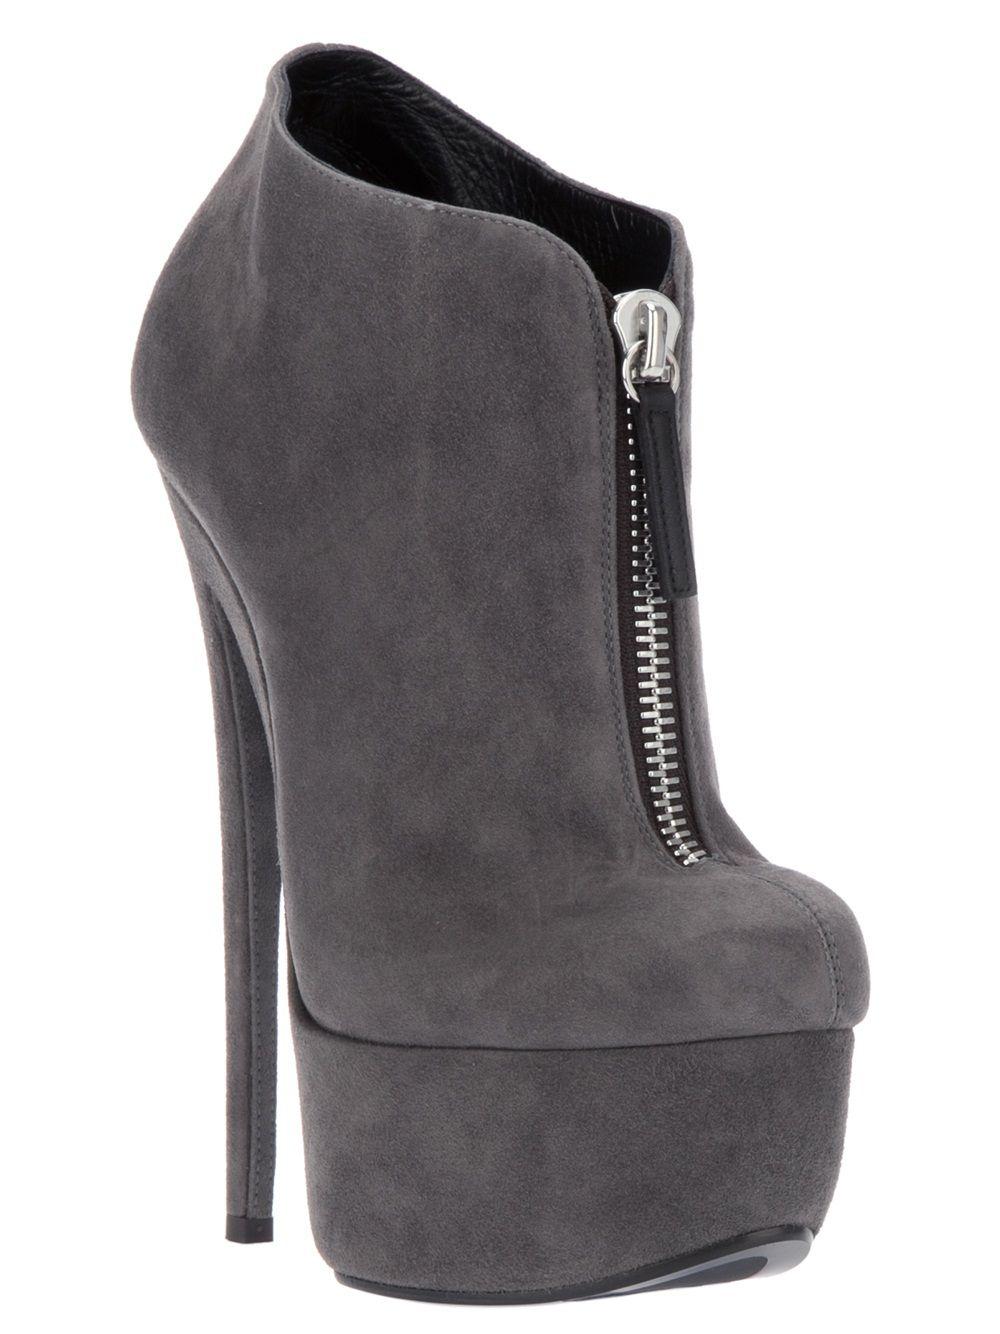 Giuseppe Zanotti Design - Platform Ankle Boot